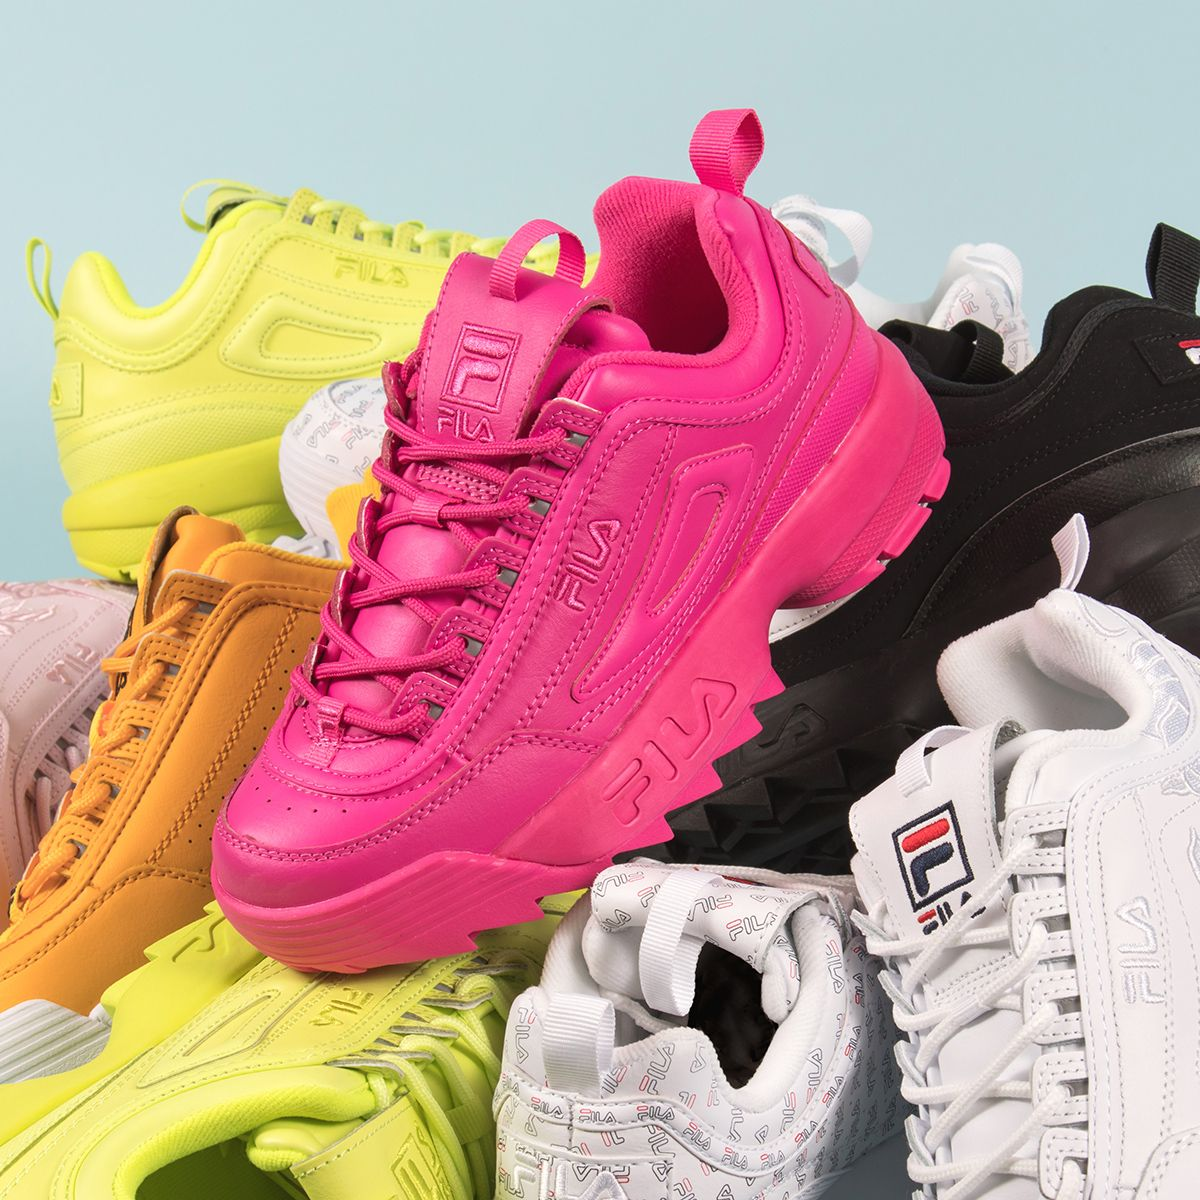 90s Fashion Inspiration for 2019 — RW